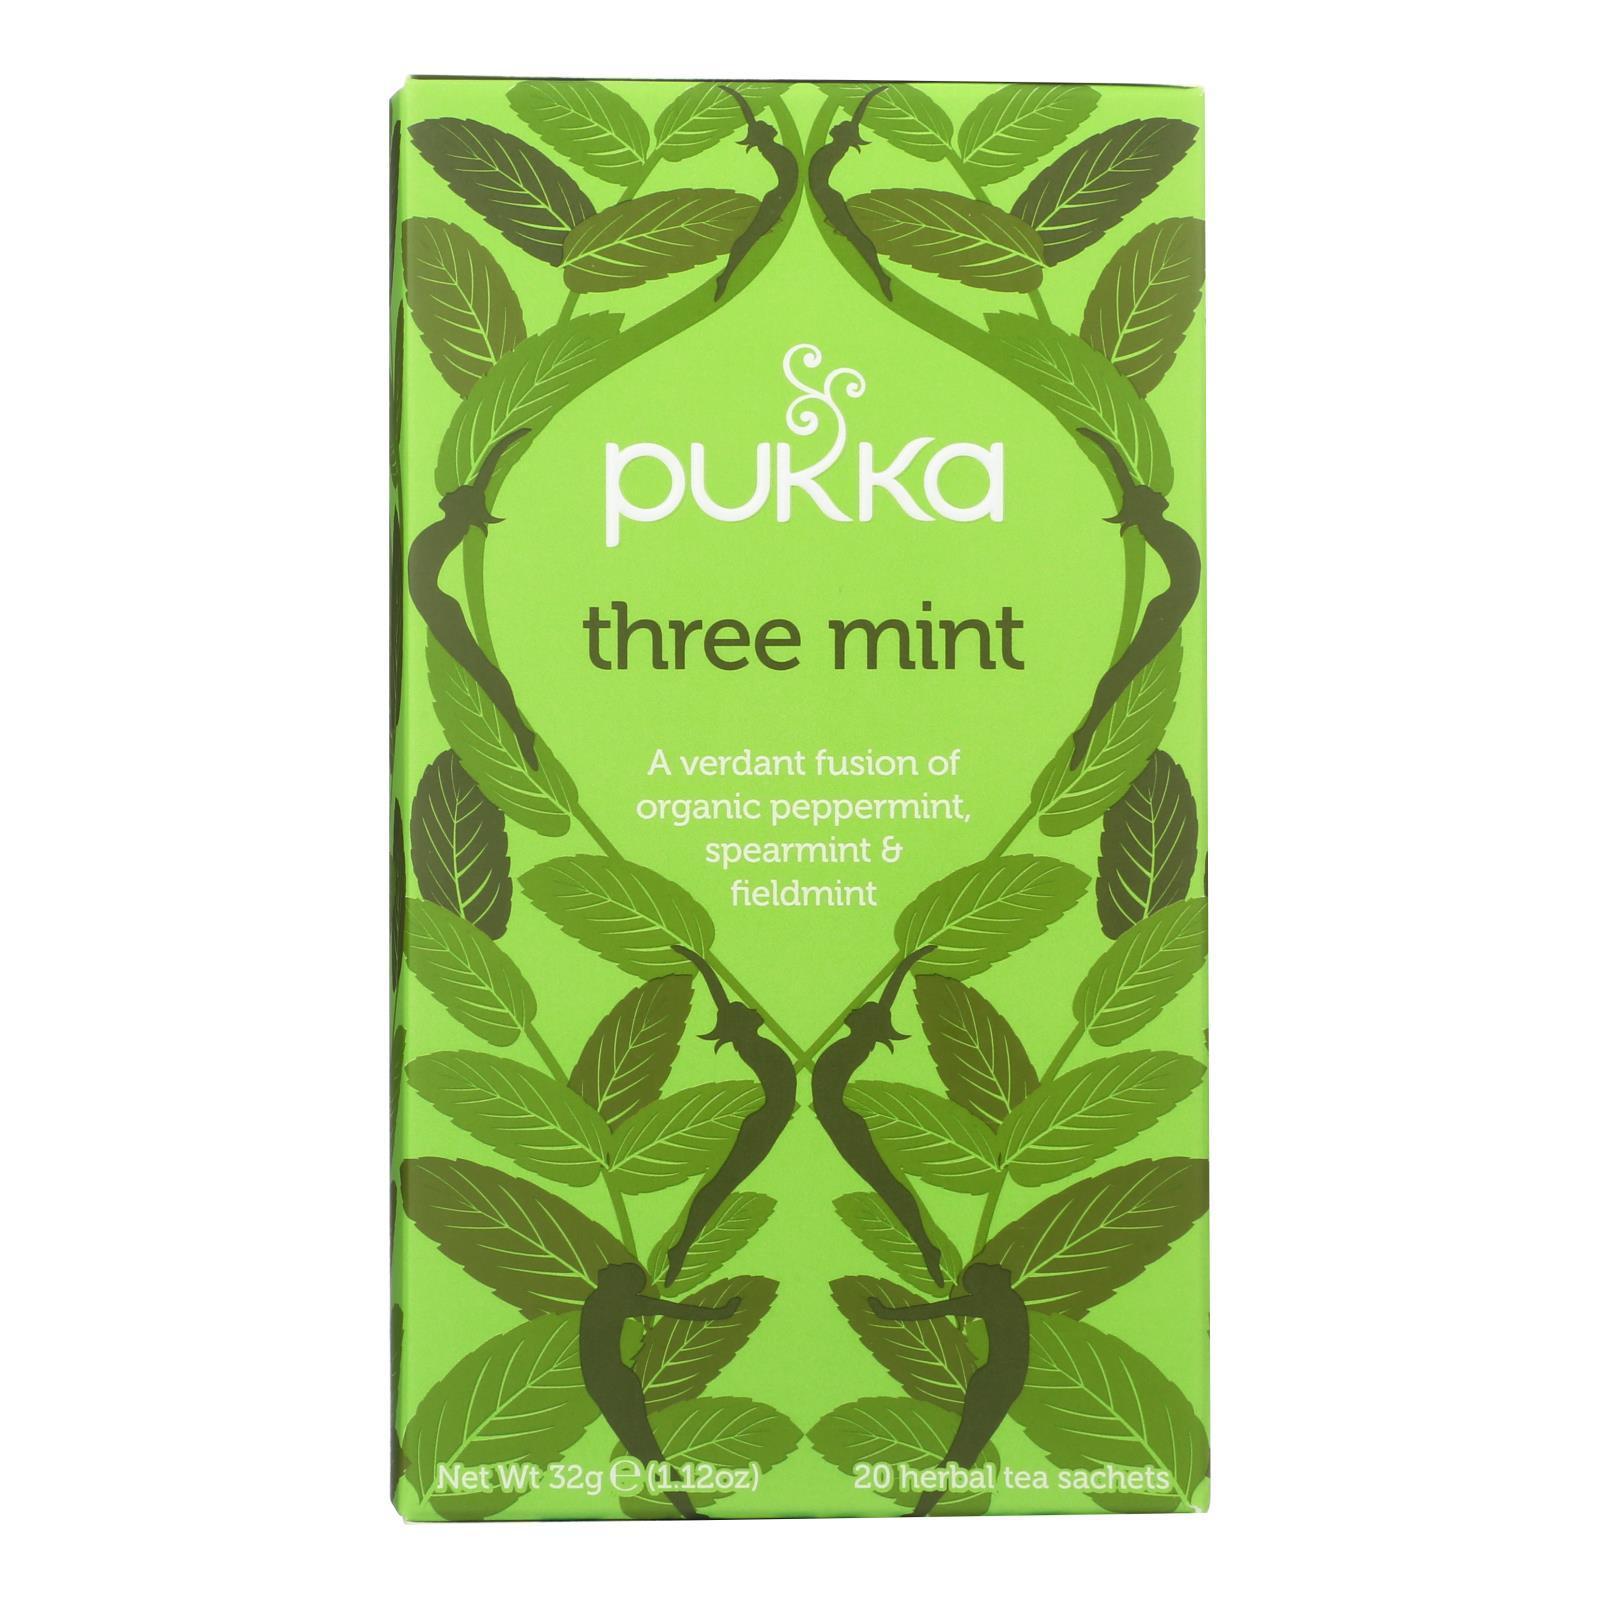 Pukka Herbal Teas Tea - Organic - Three Mint - 20 Bags - Case of 6